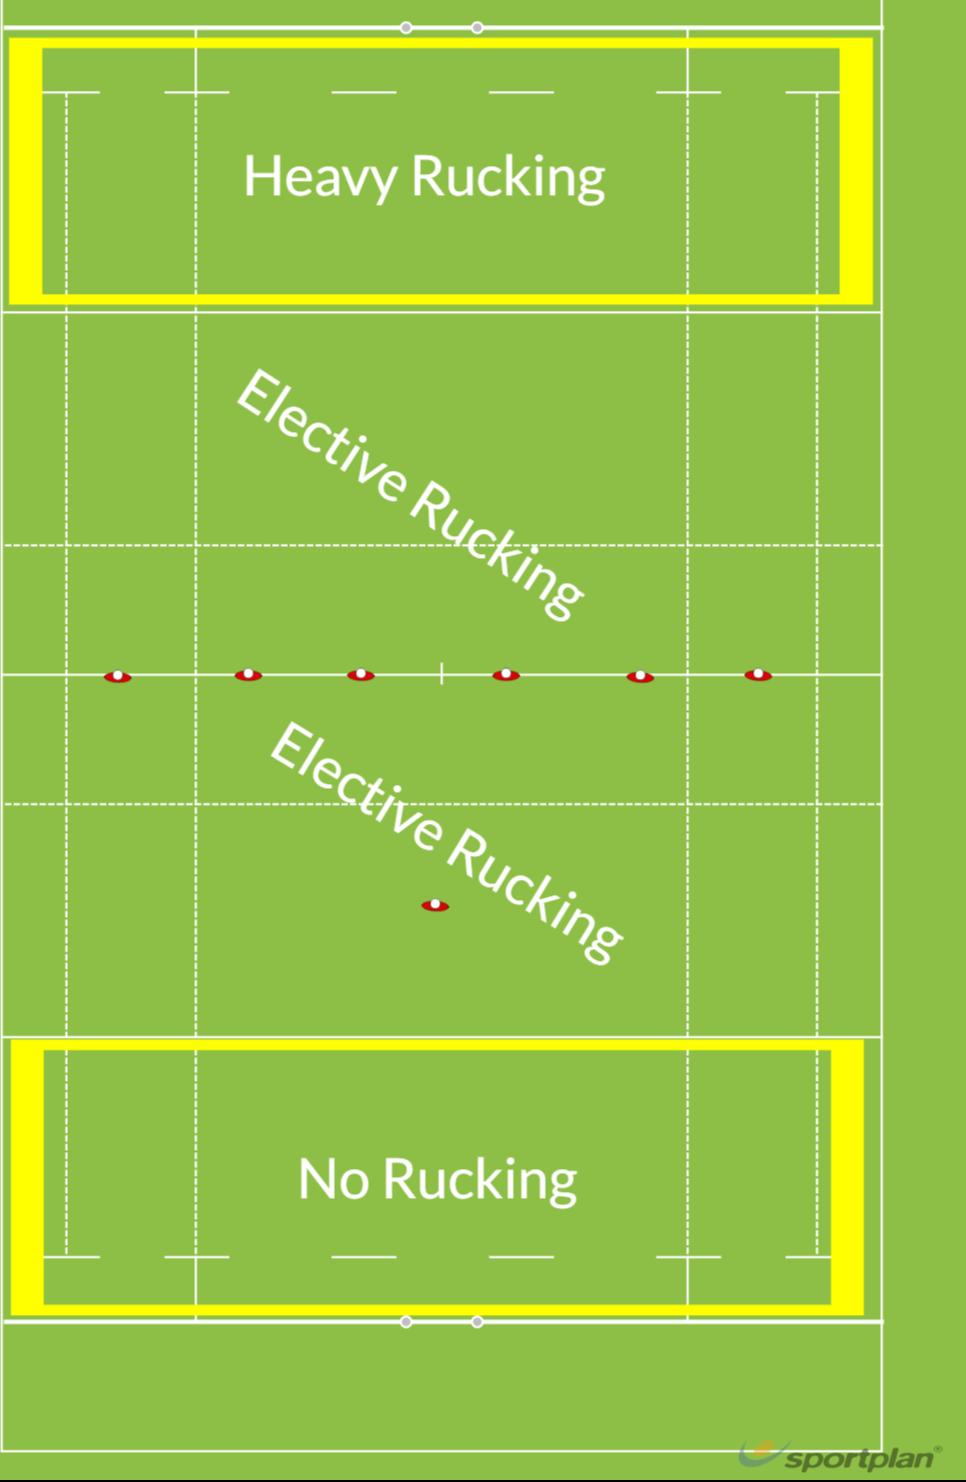 13 RuckingRugby Drills Coaching